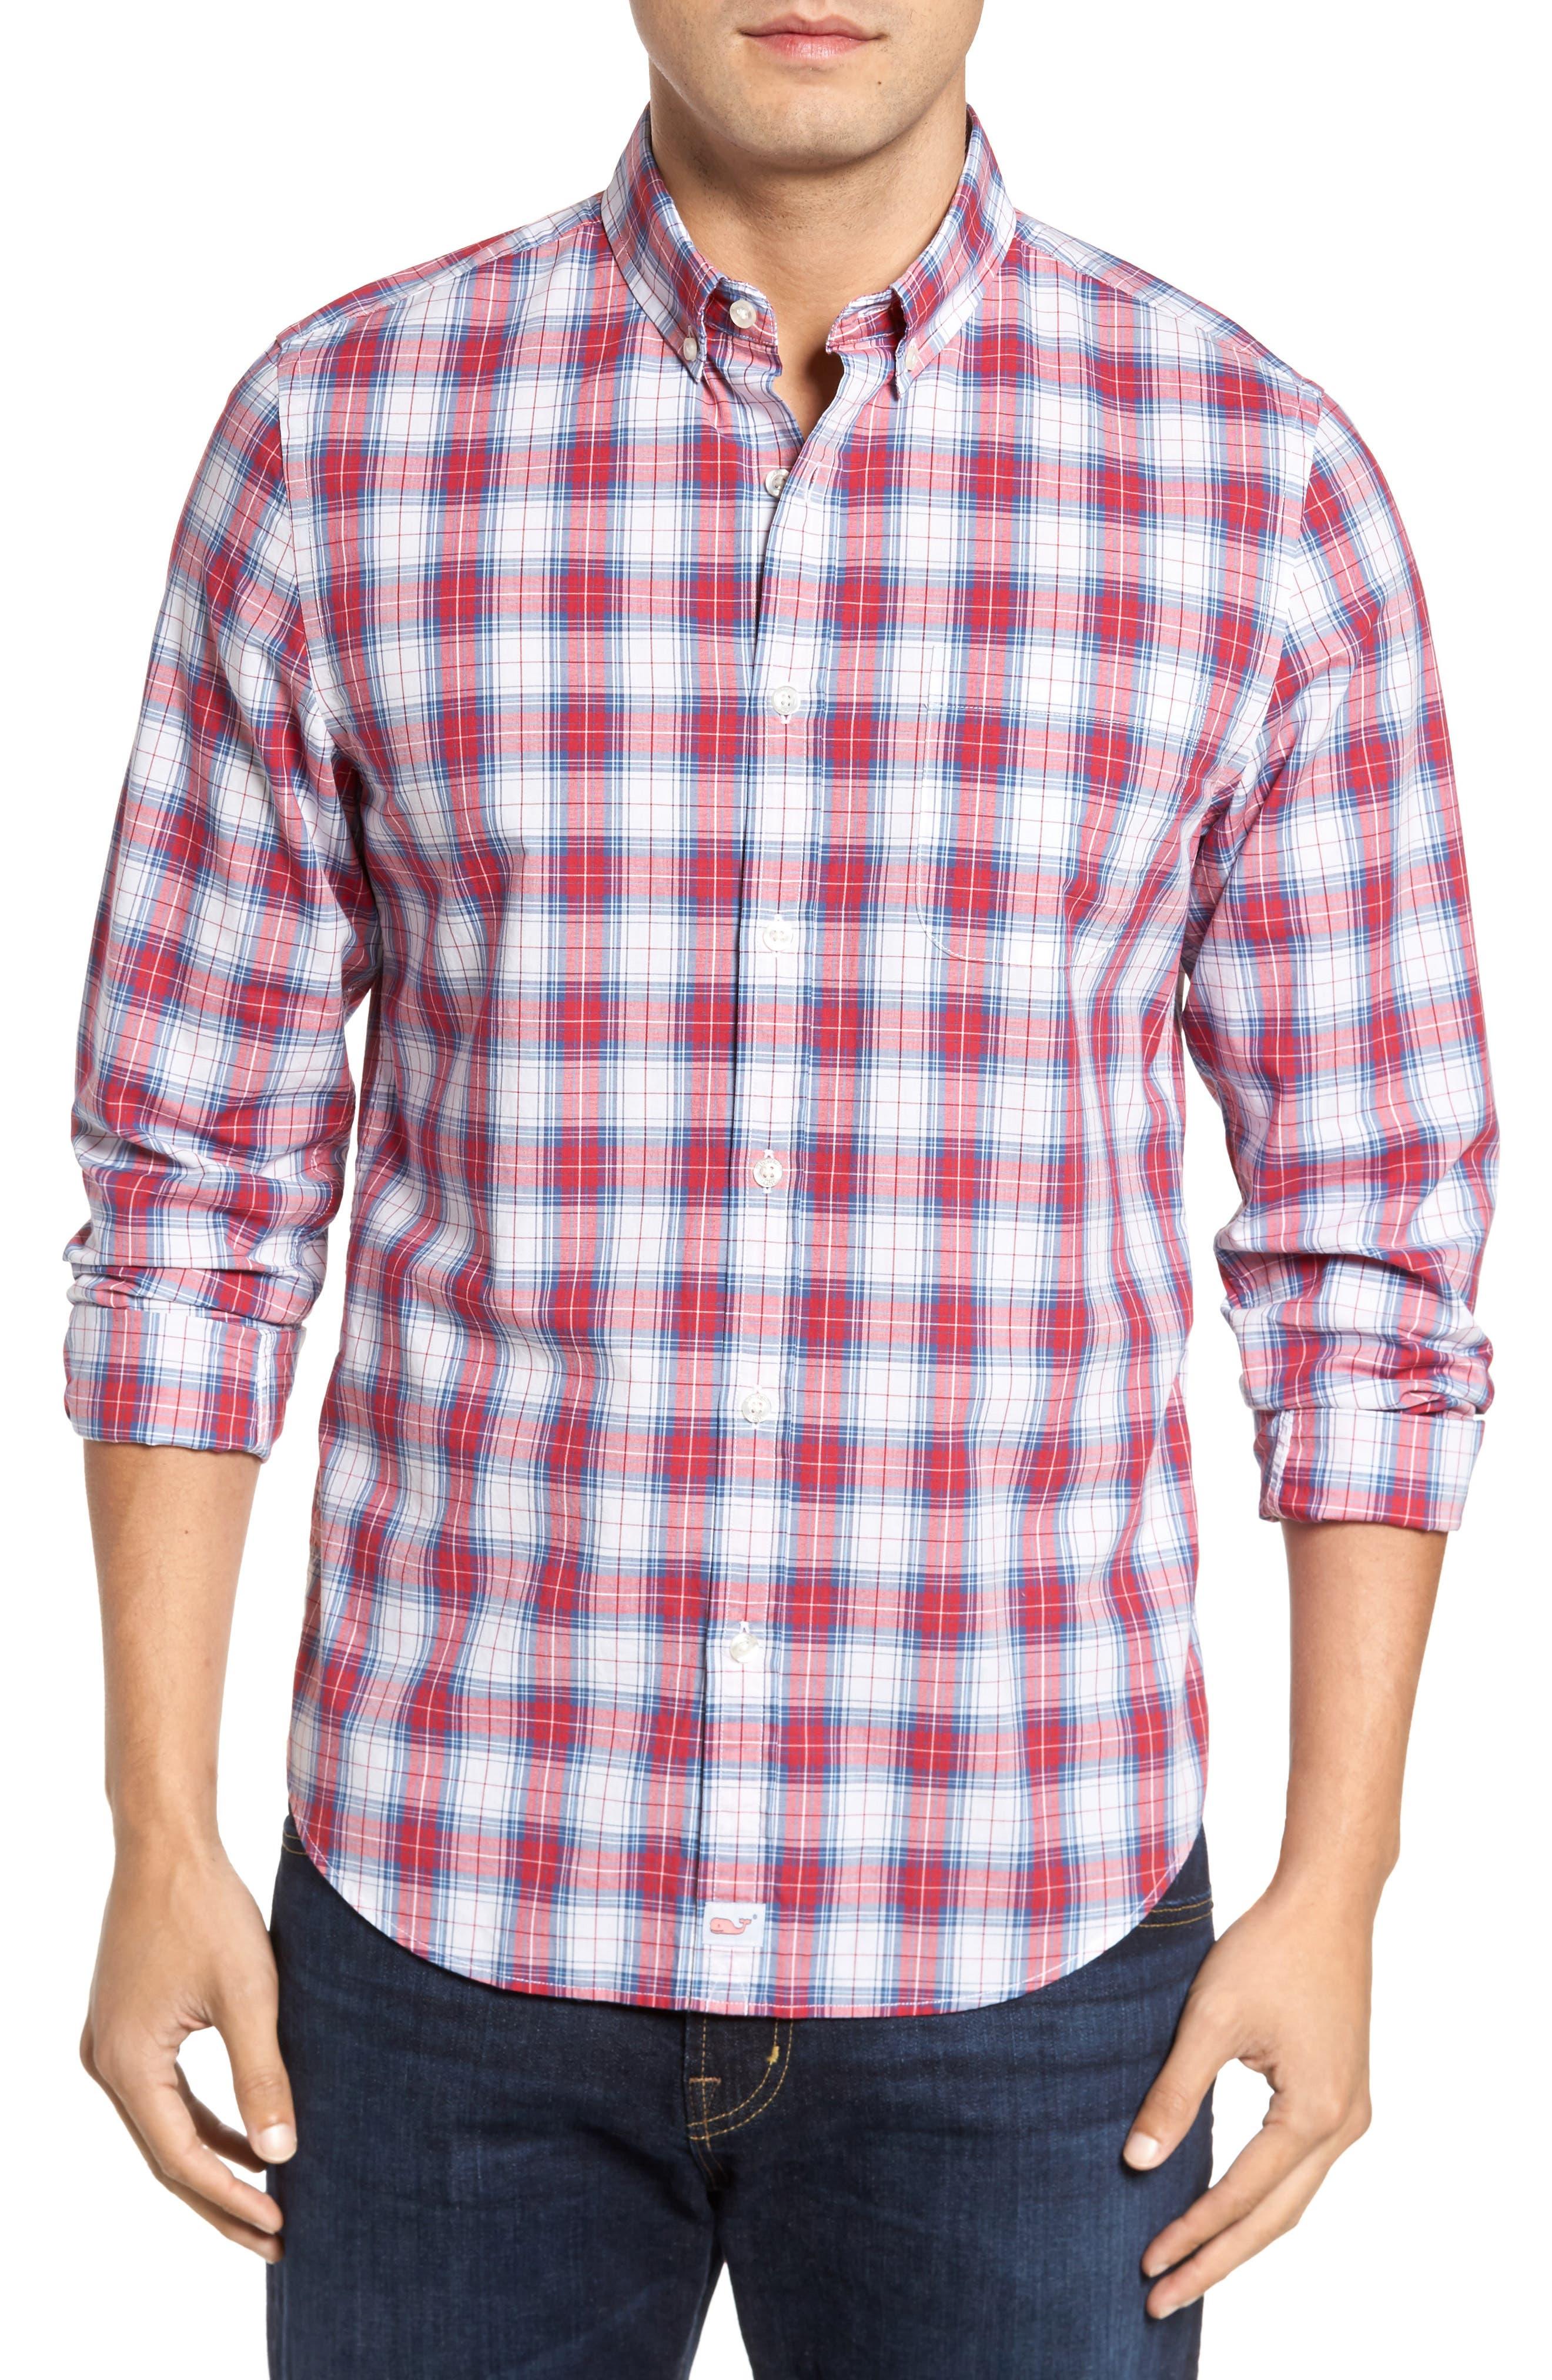 Main Image - vineyard vines Murray Bucklin Point Slim Fit Plaid Sport Shirt